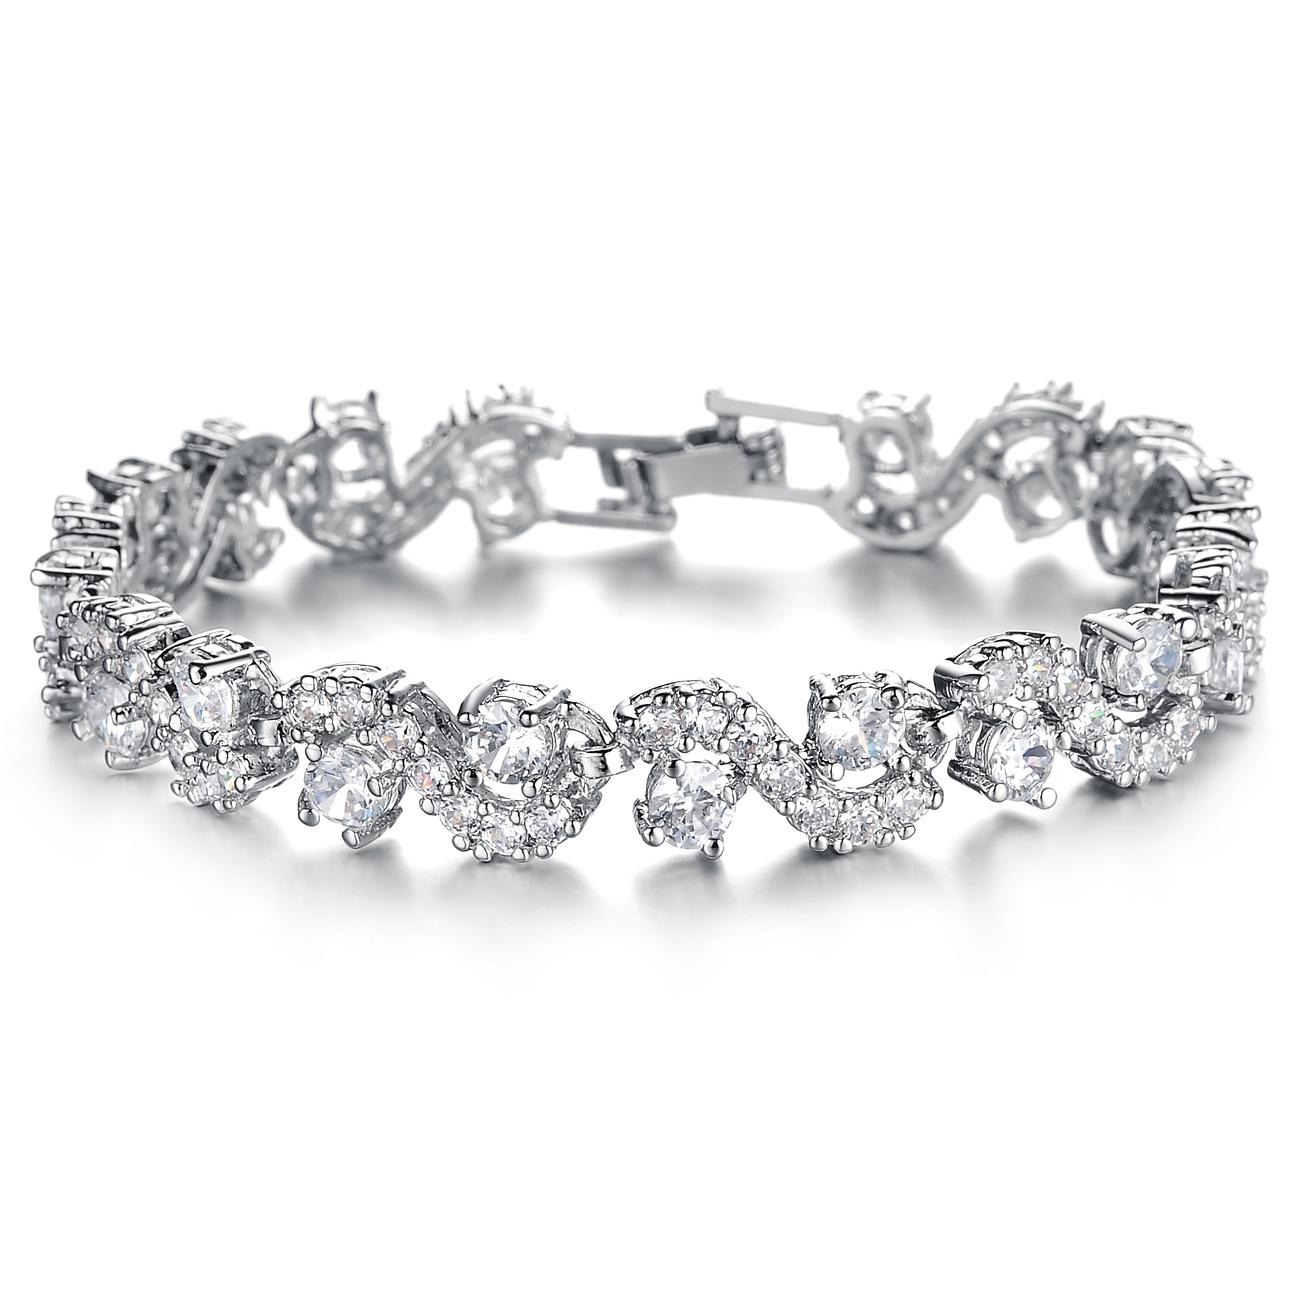 Luxury Wedding Bracelets & Bangles 18K White Gold/Silver Plated Chain White/Blue Austrian Crystal Fashion Women Bracelet(China (Mainland))